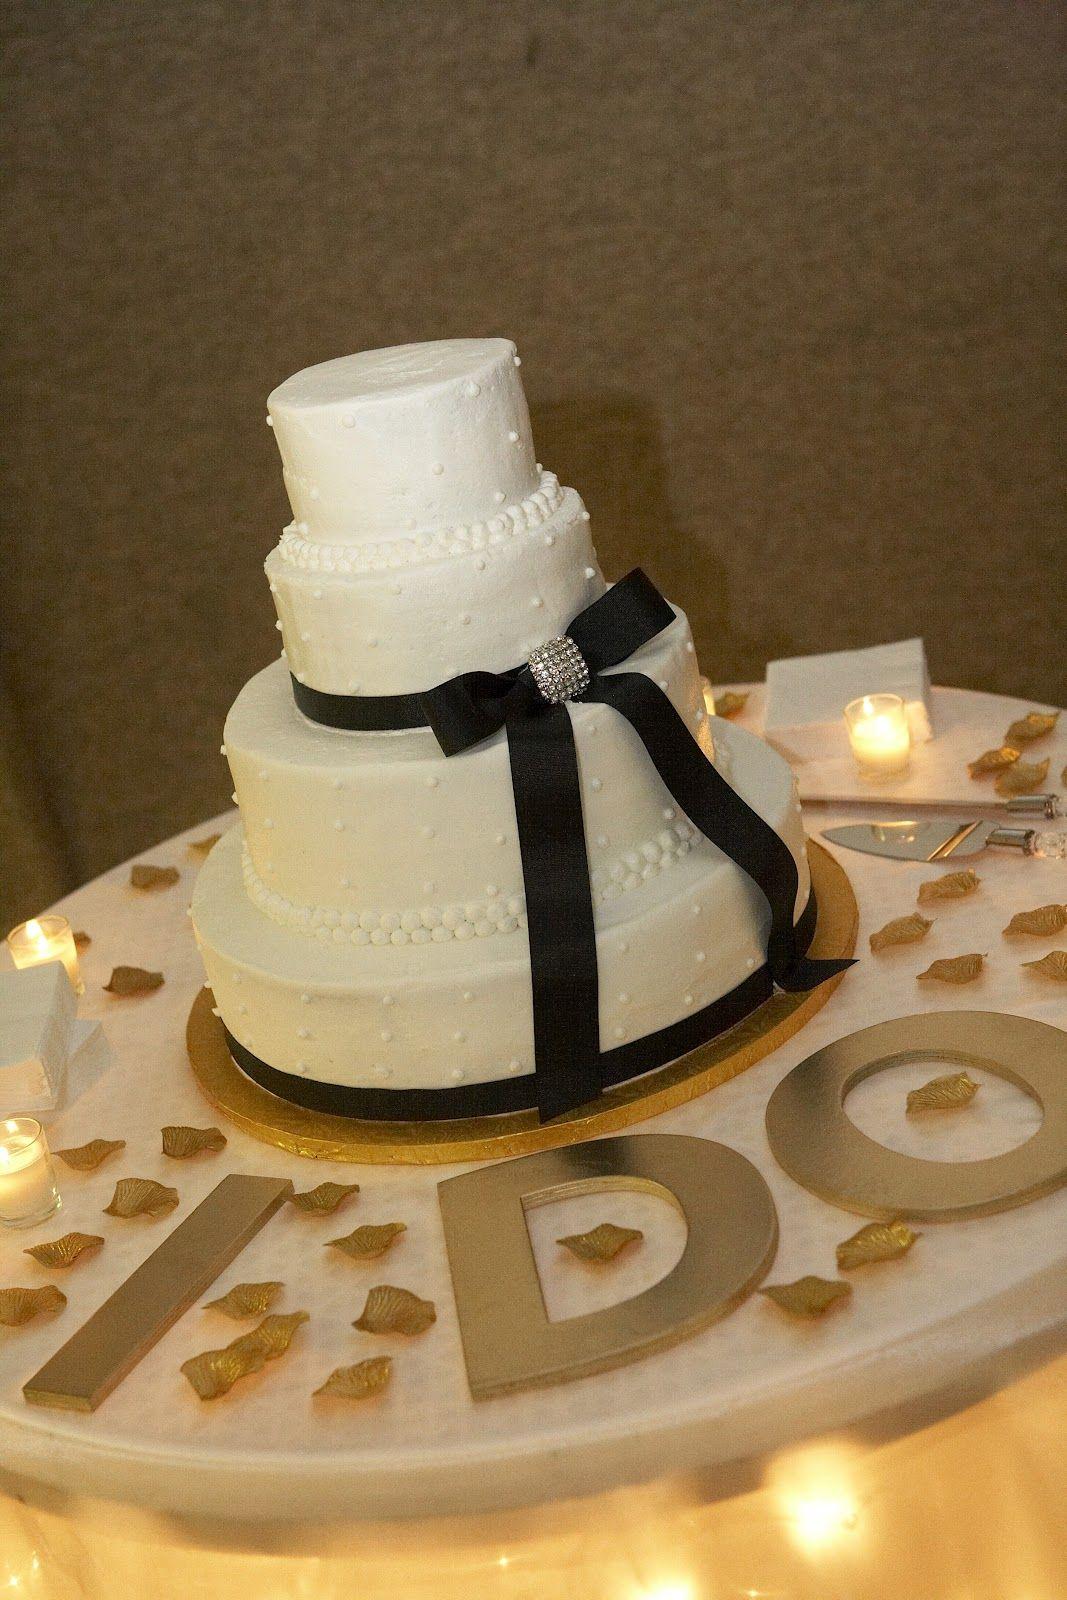 Realbrides Wedding Cake Table Decorating Ideas Cake Table Decorations Wedding Cake Table Wedding Cake Table Decorations